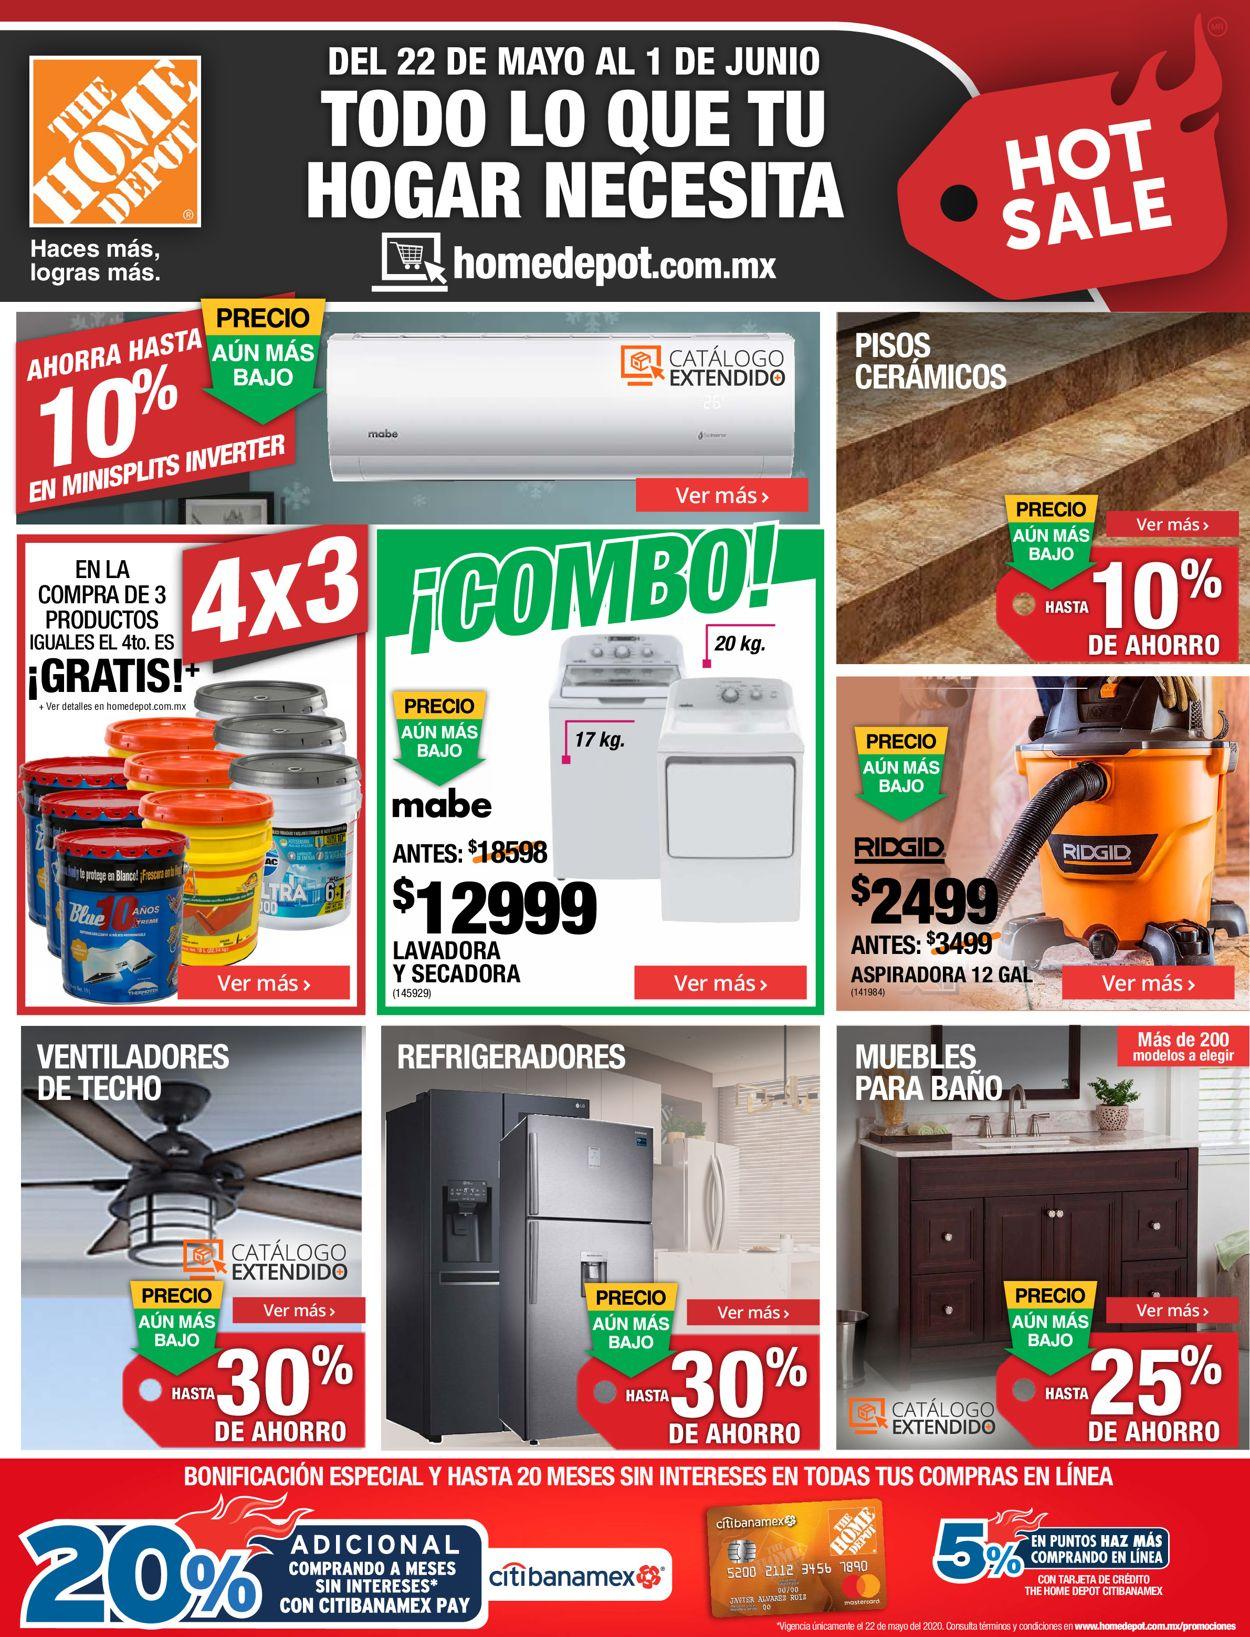 The Home Depot Folleto - 22.05-01.06.2020